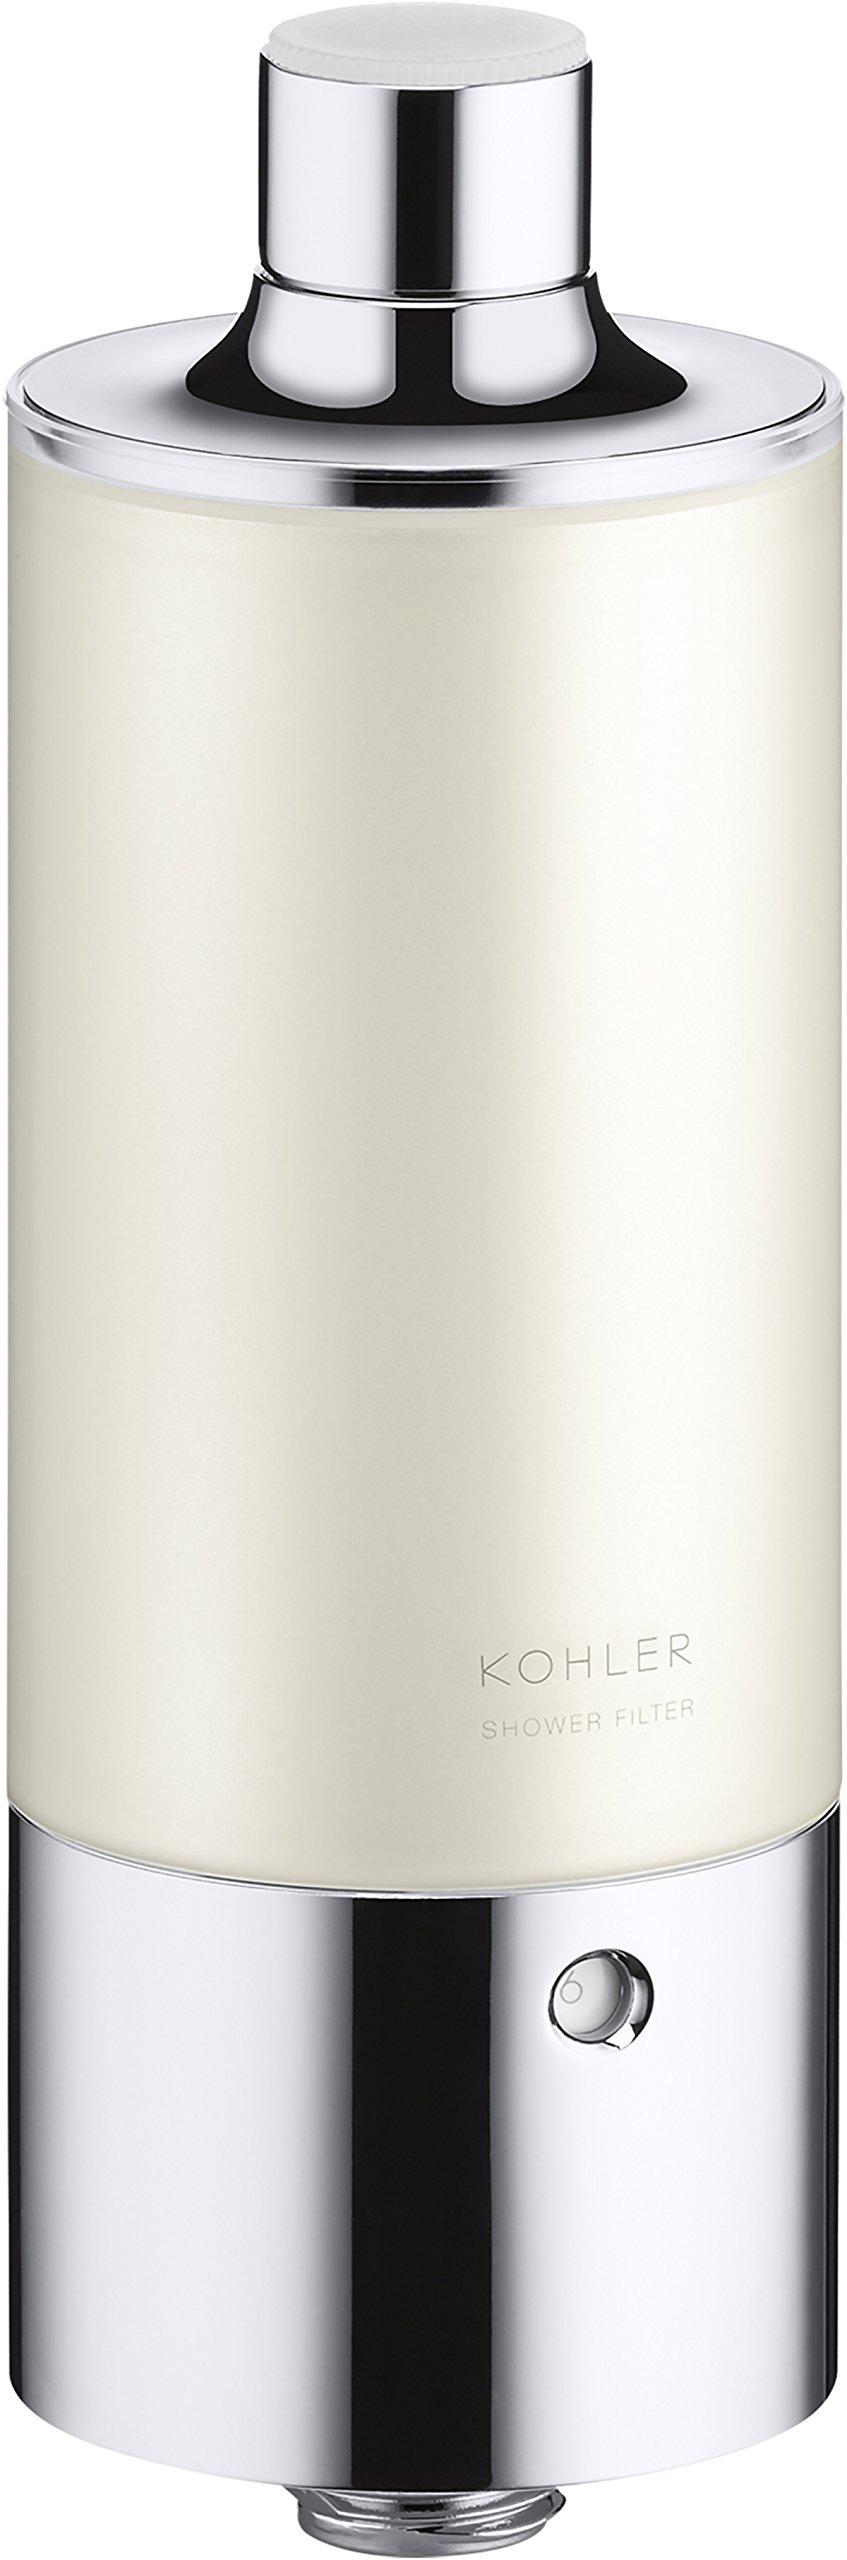 Kohler 30646-CP Aquifer Shower Water Filtration System, Reduce Chlorine and Odor, Includes Filter Replacement by Kohler (Image #2)